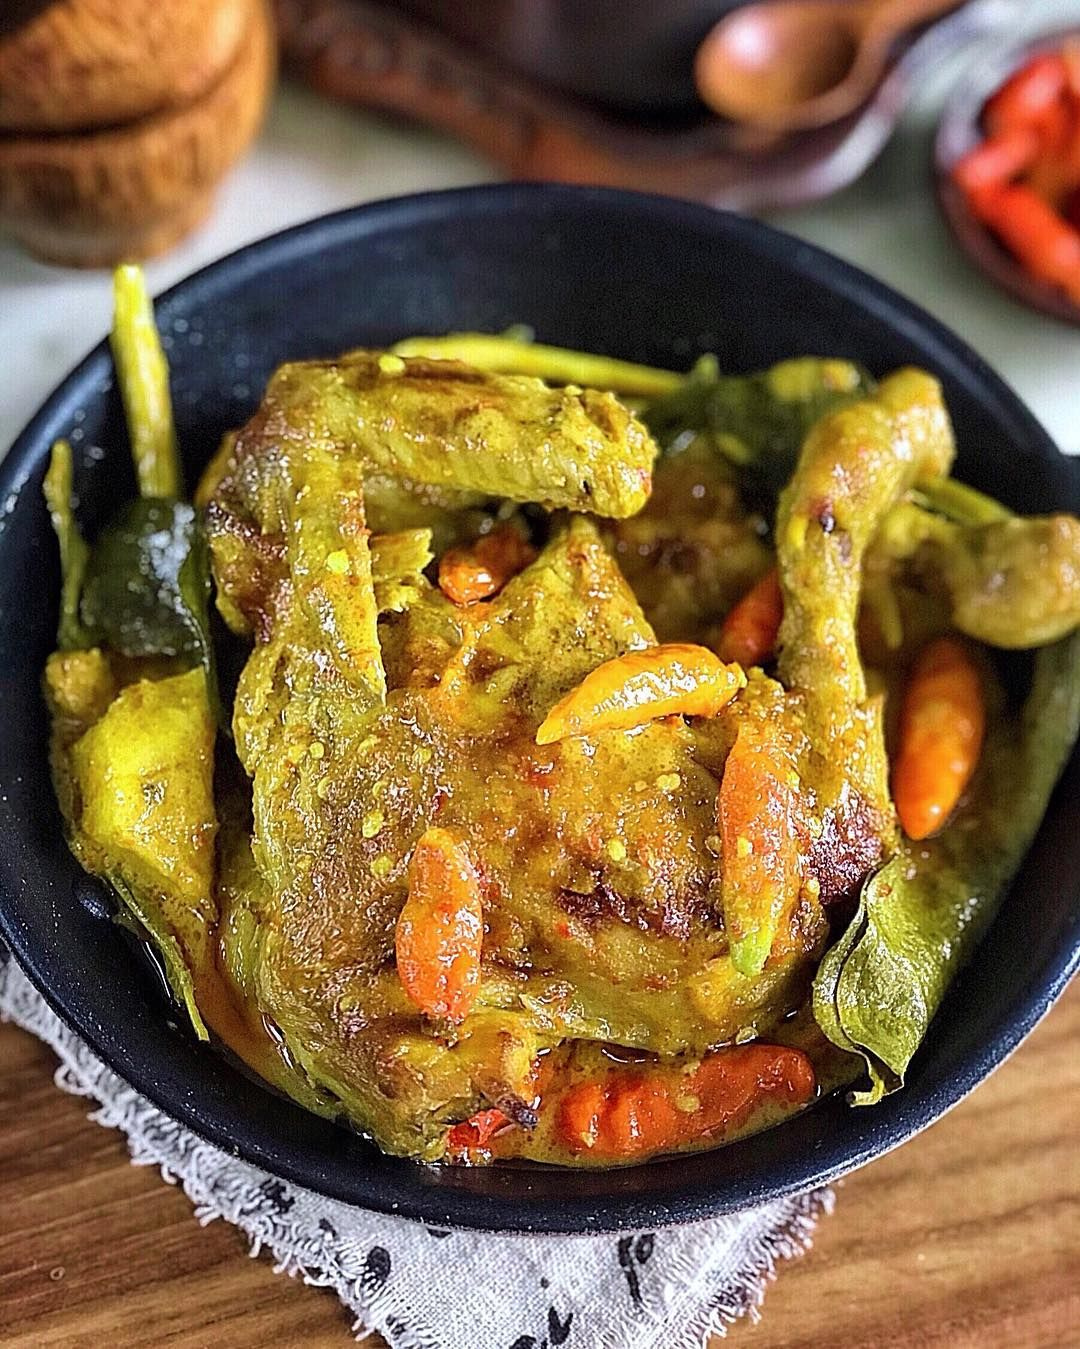 Resep Ayam Lodho Pedas Yang Maknyus Asli Trenggalek Jawa Timur Resep Ayam Resep Masakan Masakan